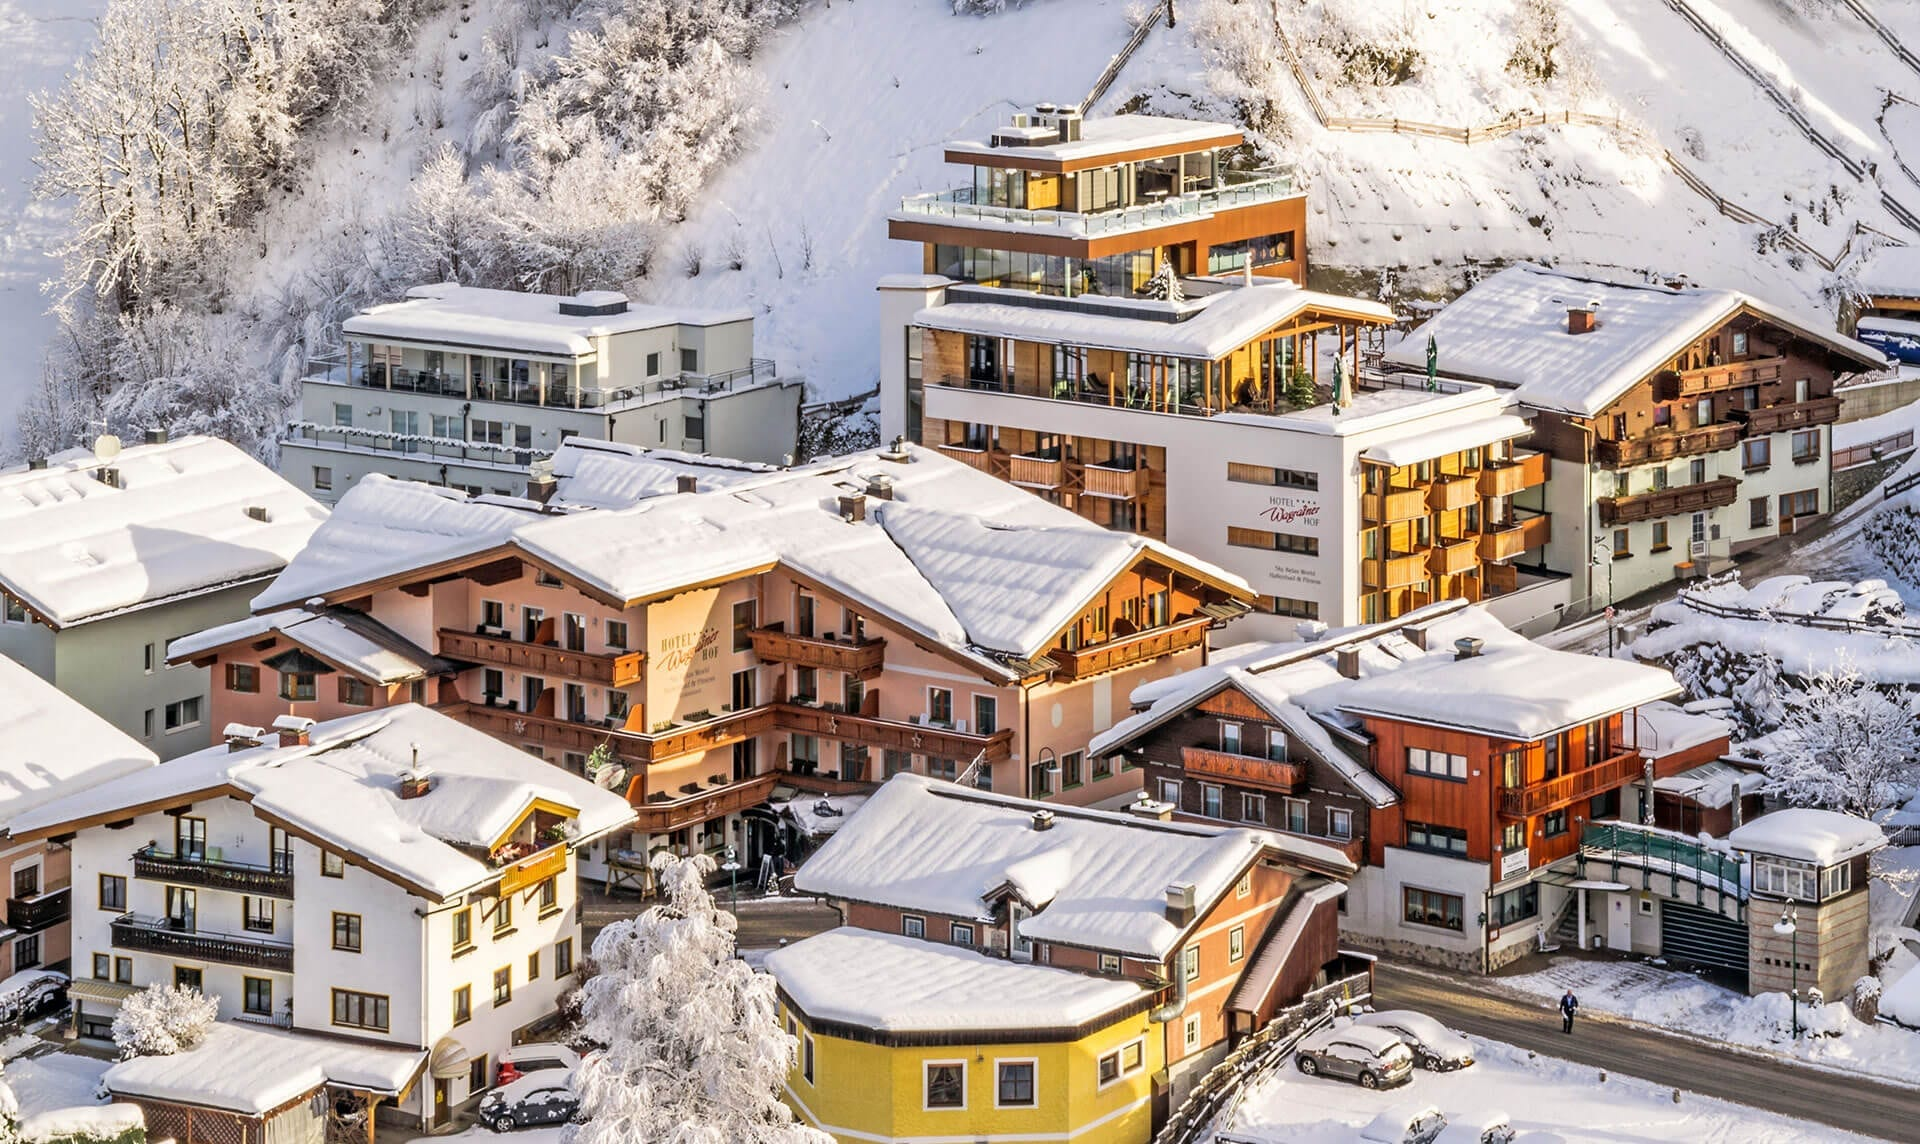 Skihotel in Wagrain, Salzburger Land - Hotel Wagrainerhof